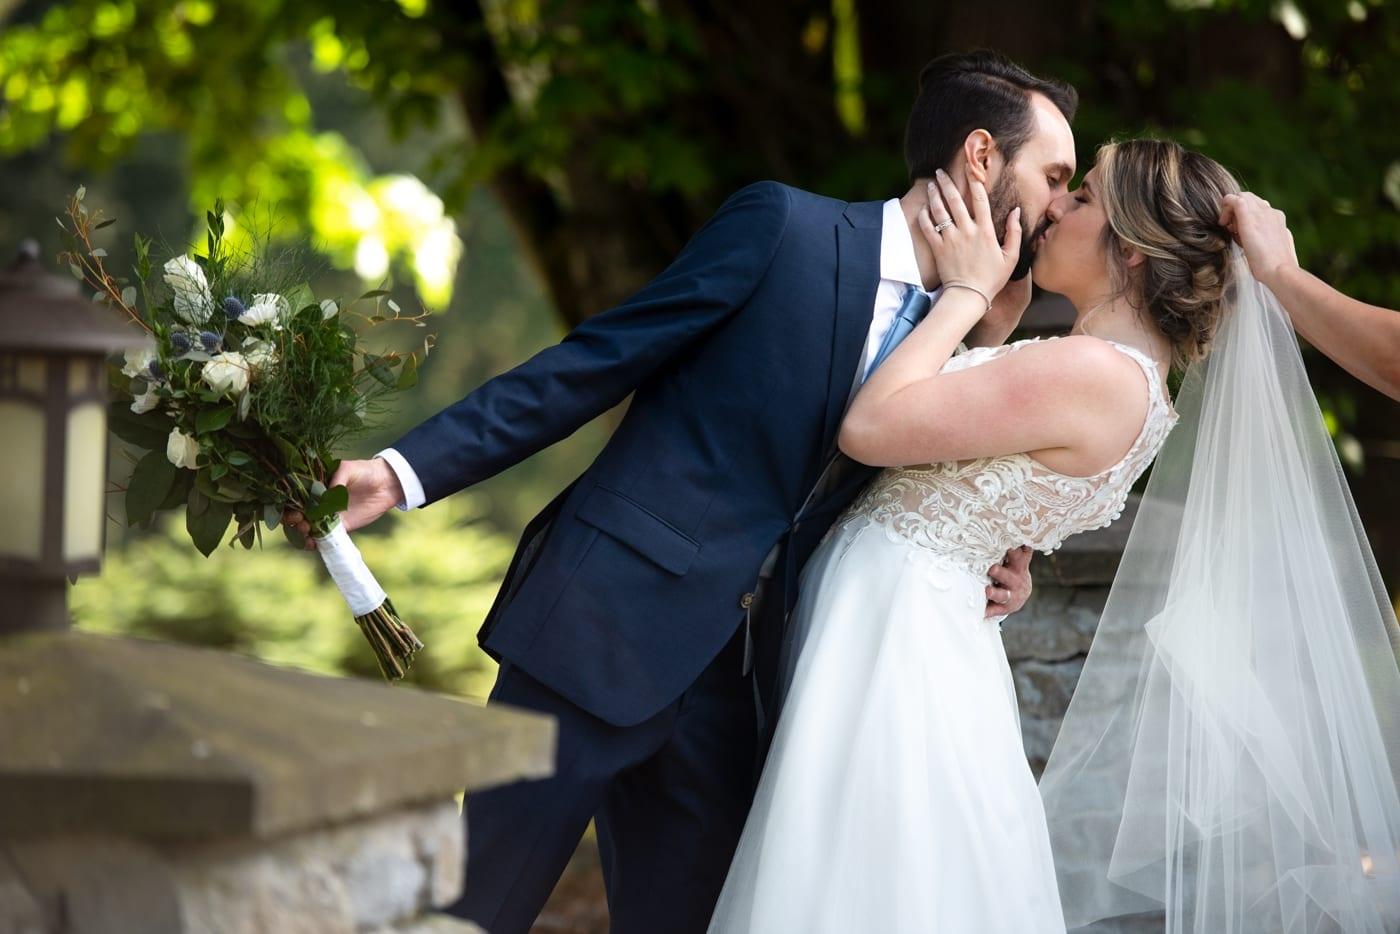 Wedding-Kiss-Trinity-Tree-Farm-Wedding-Photos-Greener-Visuals